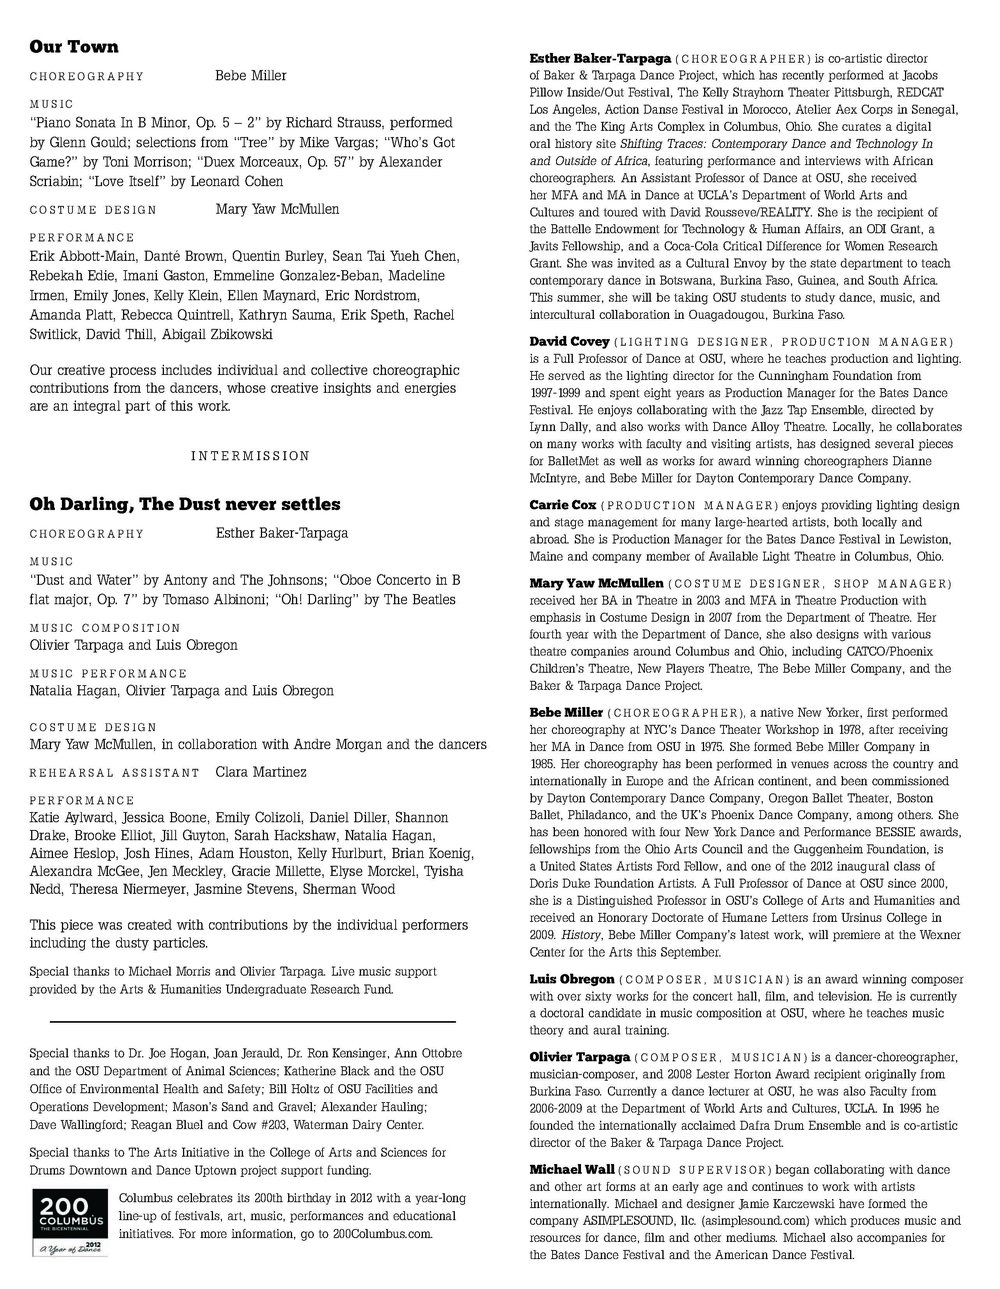 SP12_DanceUptownDIRT_Page_2.jpg